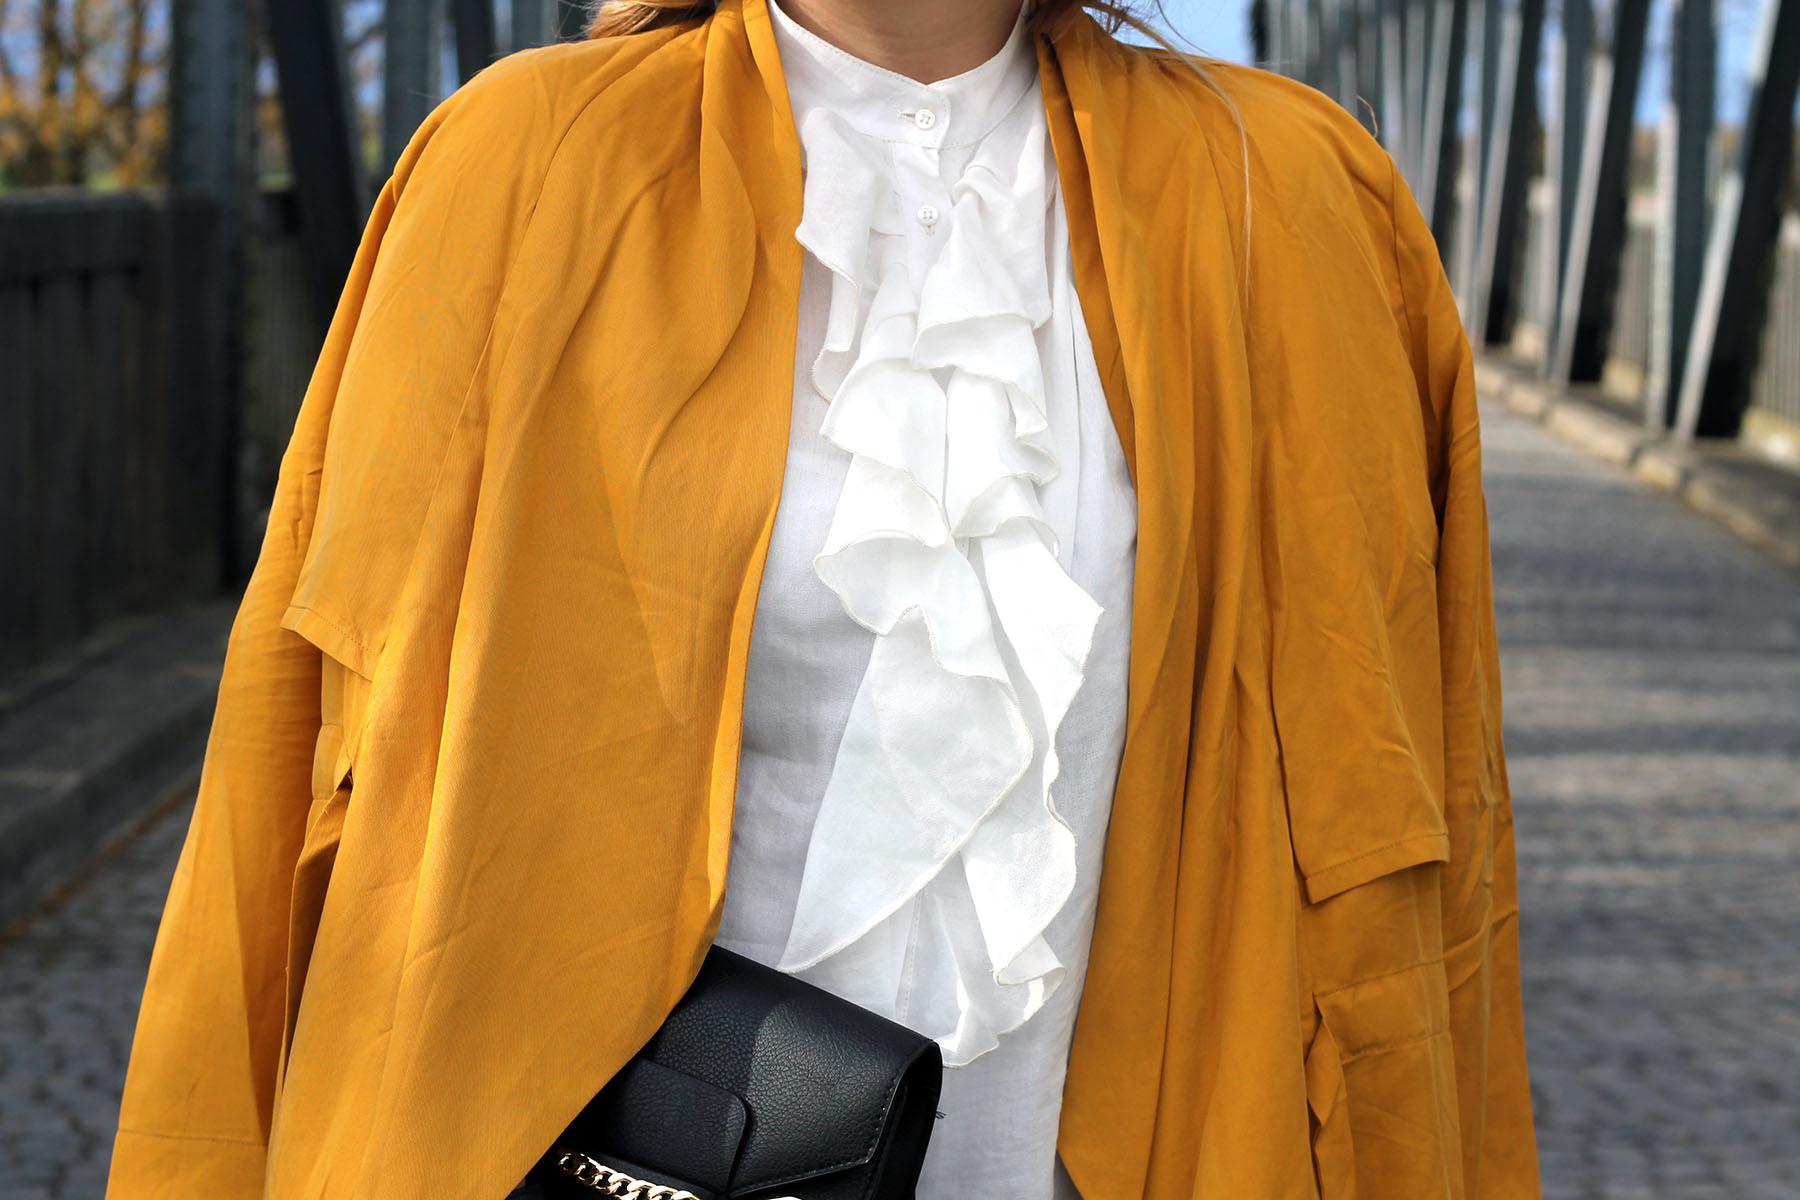 outfit-gelber-mantel-bluse-rüschen-trend-look-modeblog